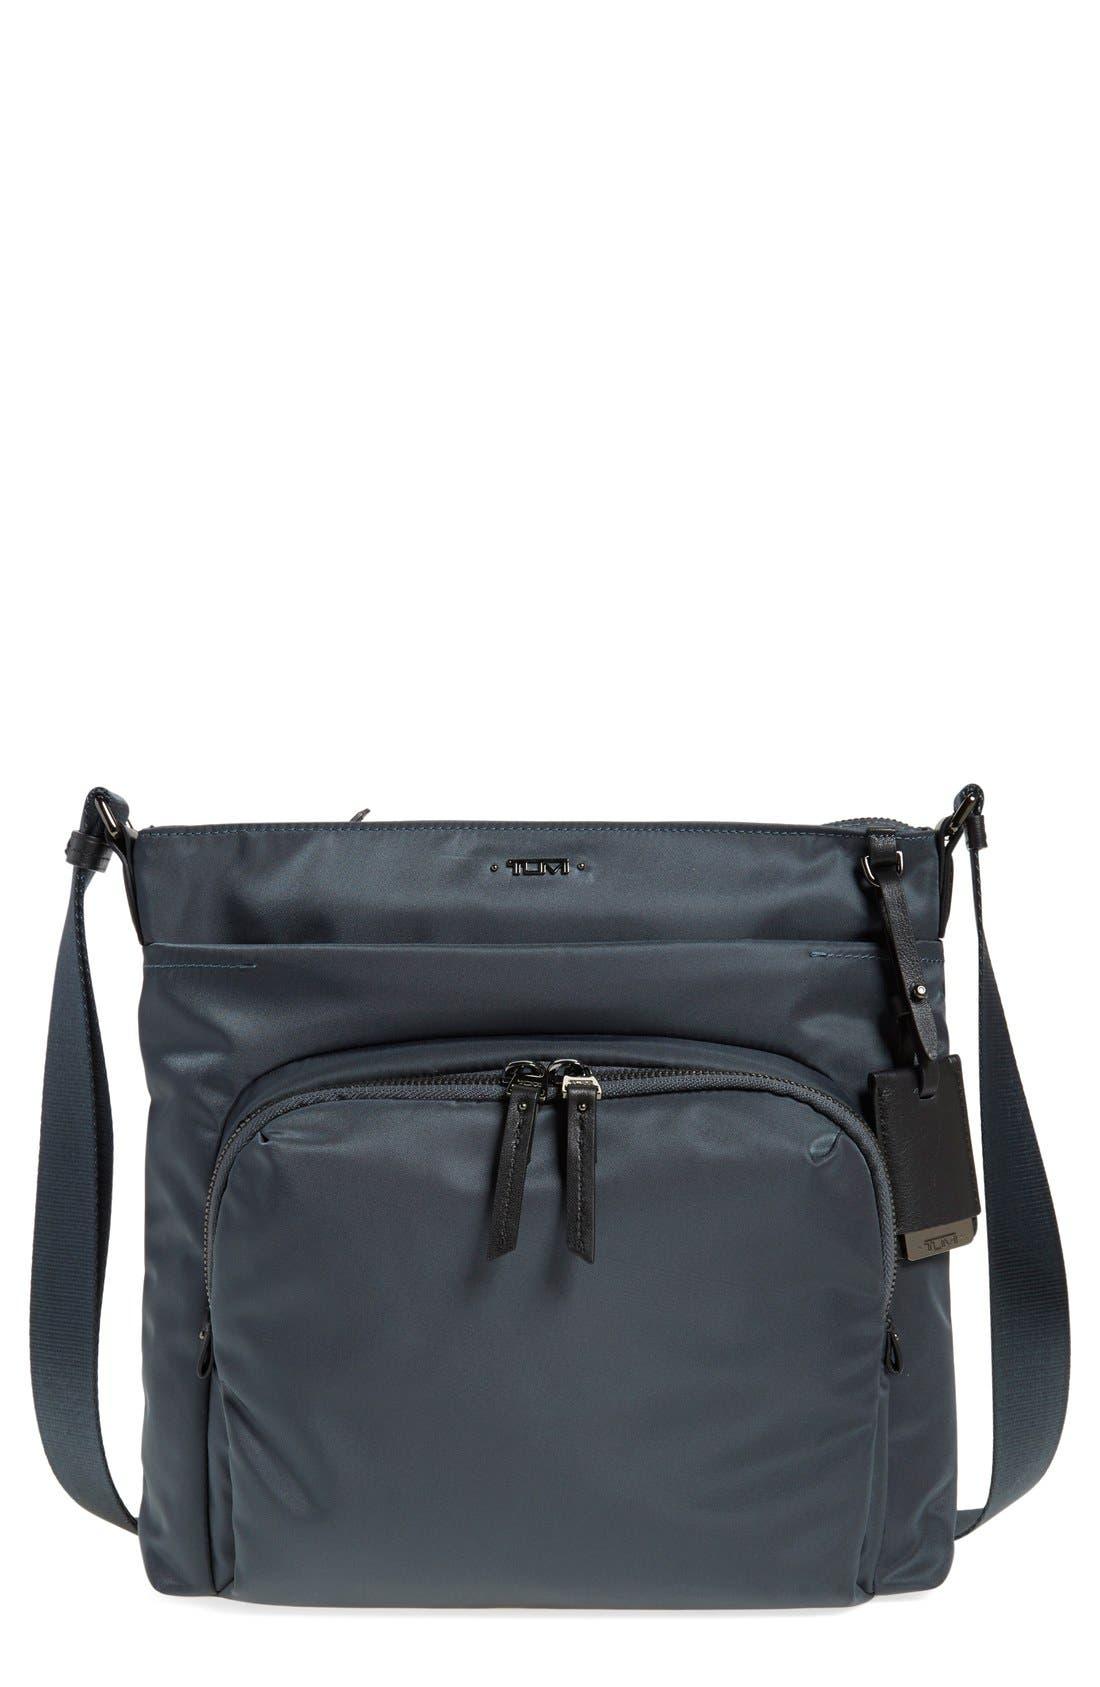 TUMI 'Voyageur - Capri' Crossbody Bag, Main, color, 020